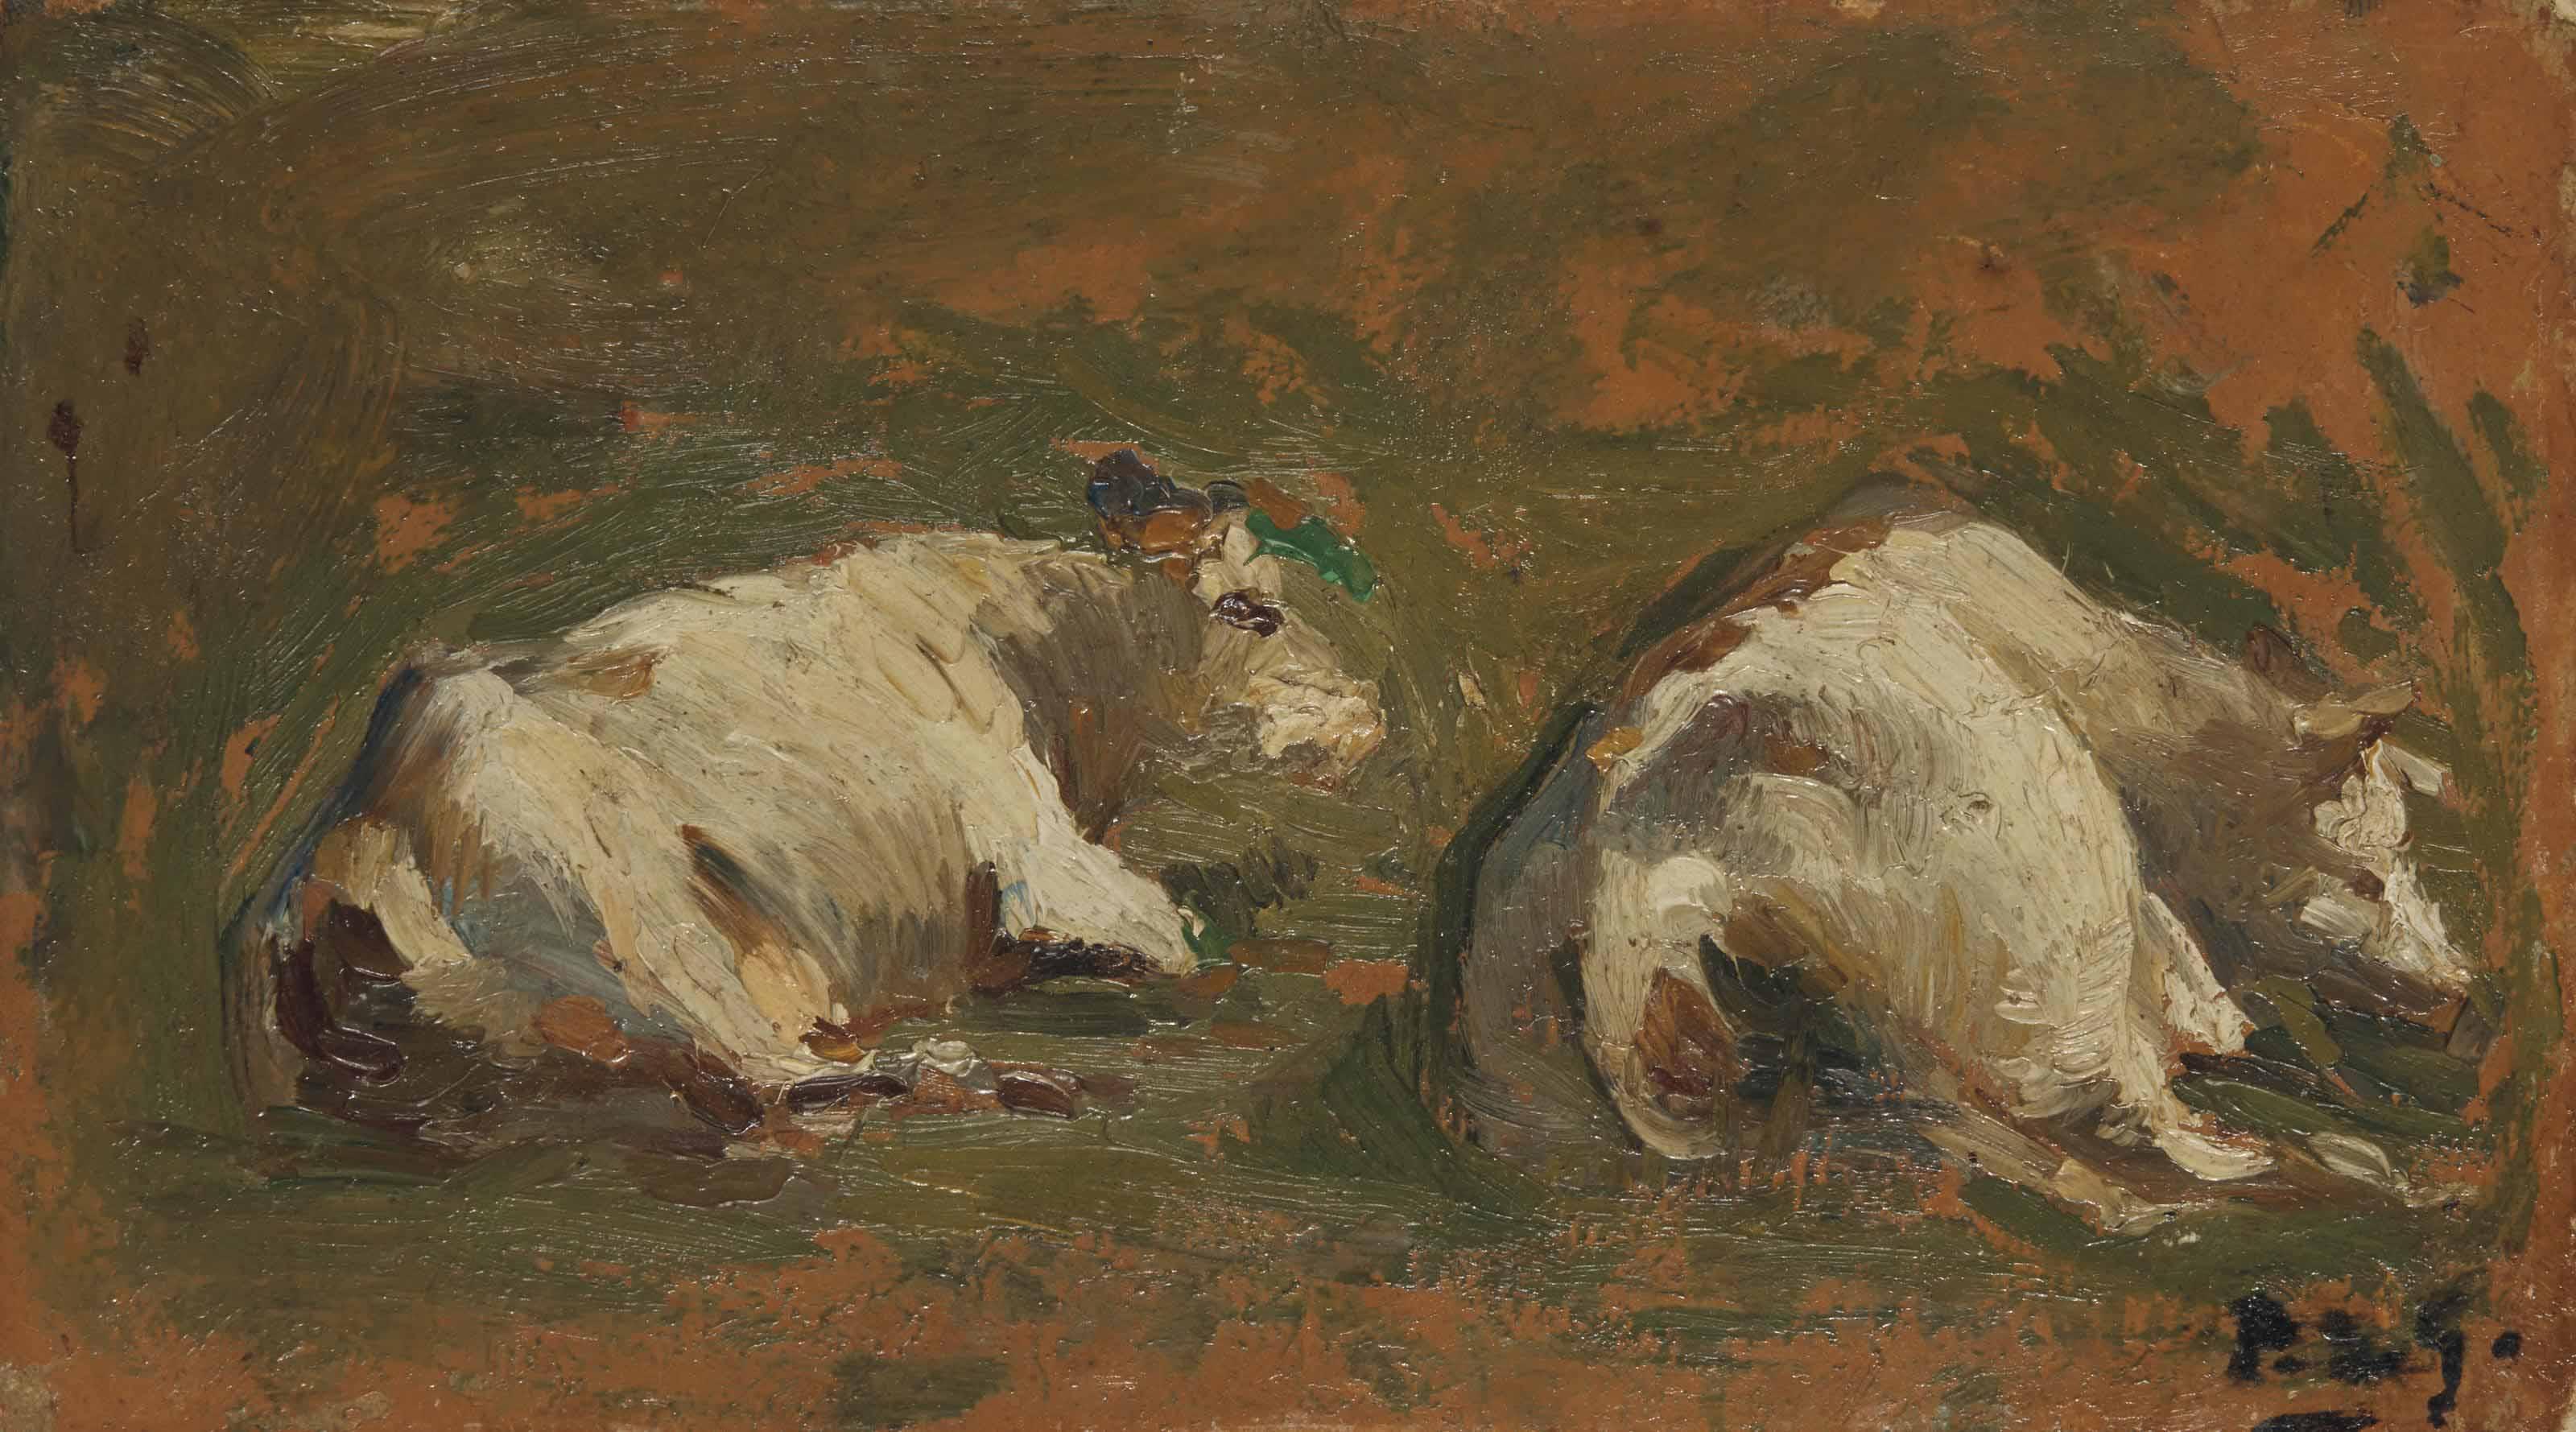 Deux vaches blanches